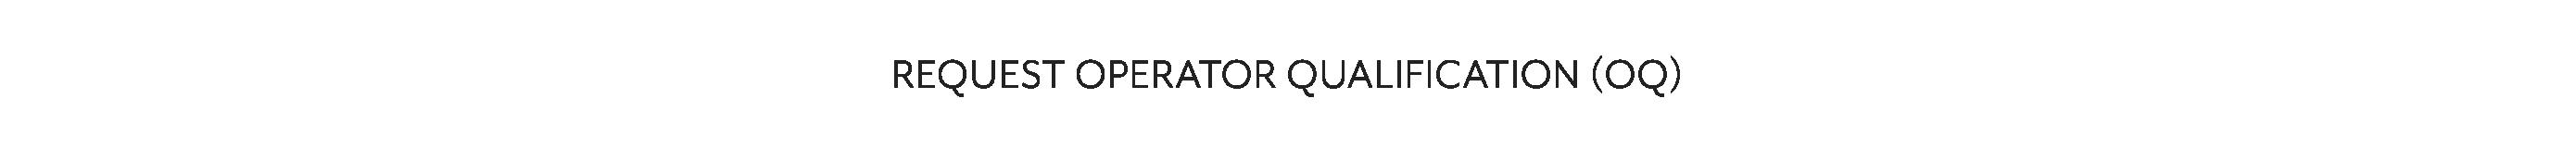 Request Operator Qualification (OQ)